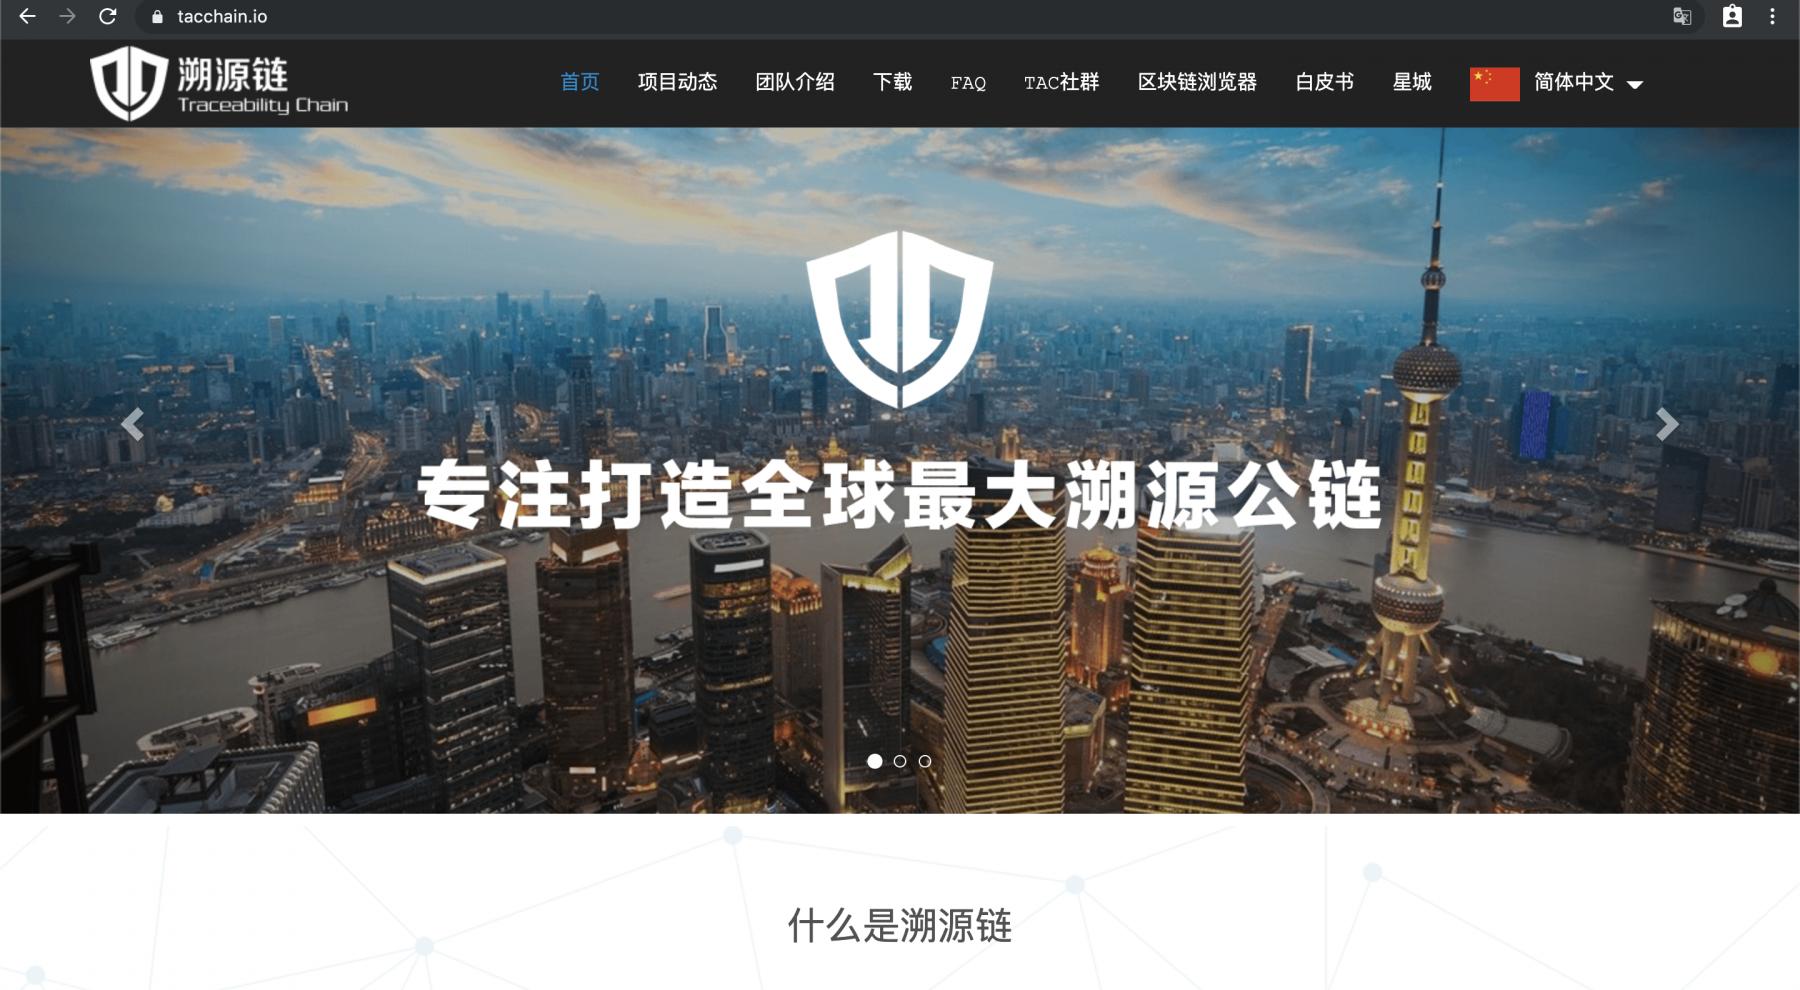 Screenshot of TAC website